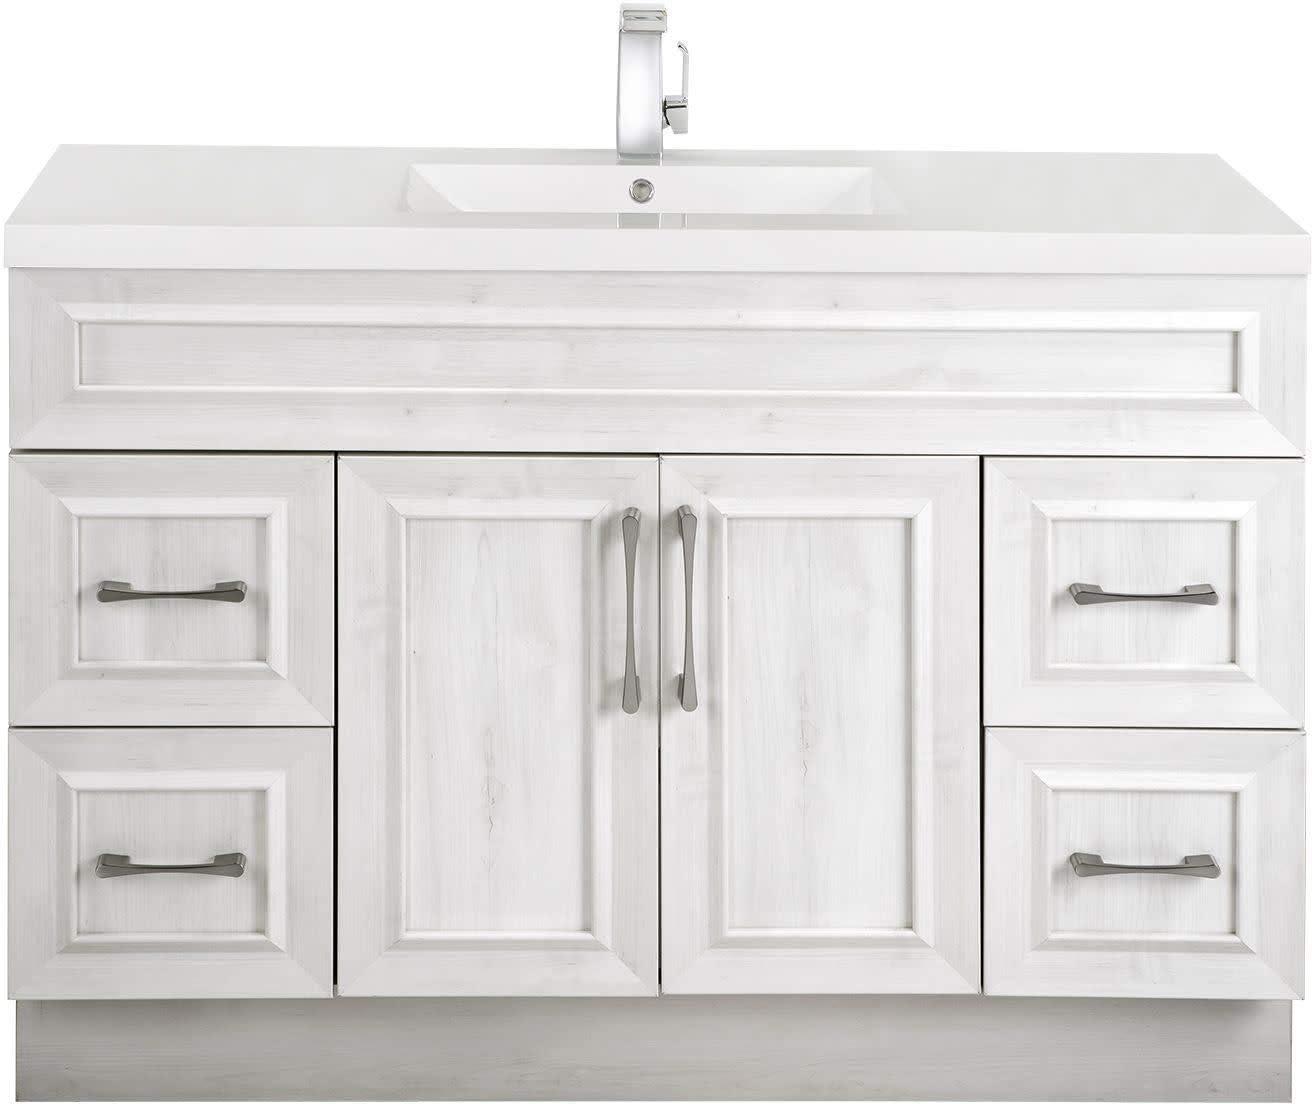 Amazon Com Cutler Kitchen Bath Classic Collection 48 Bathroom Vanity Single Bowl Top Fogo Harbor Furniture Decor